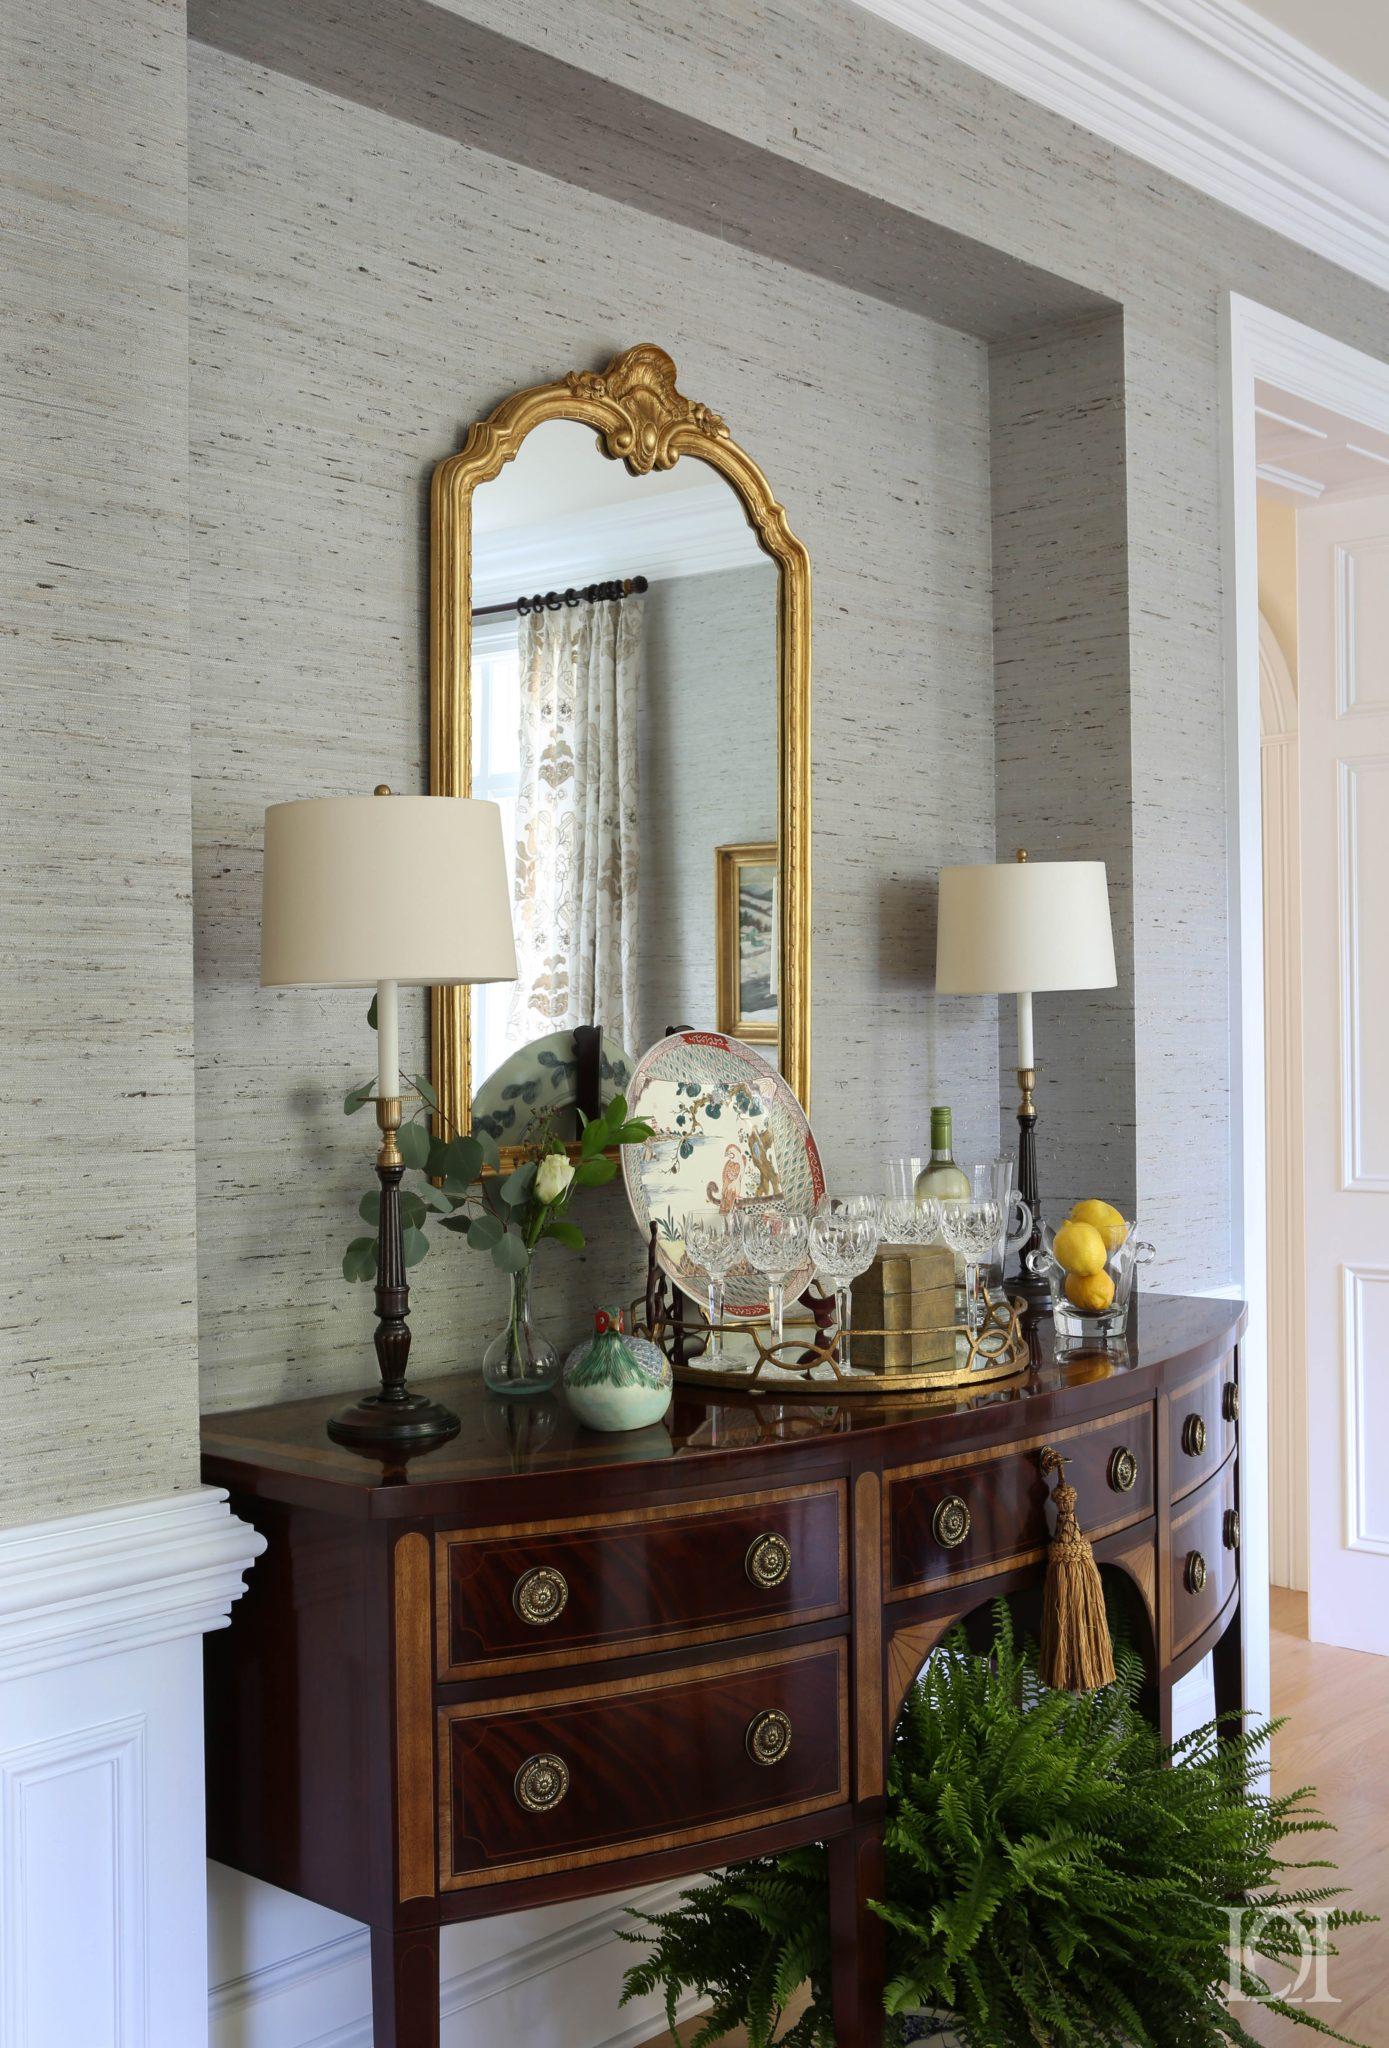 Cradle Rock Dining room detail sideboard with Mirror by Deborah Leamann Interior Design